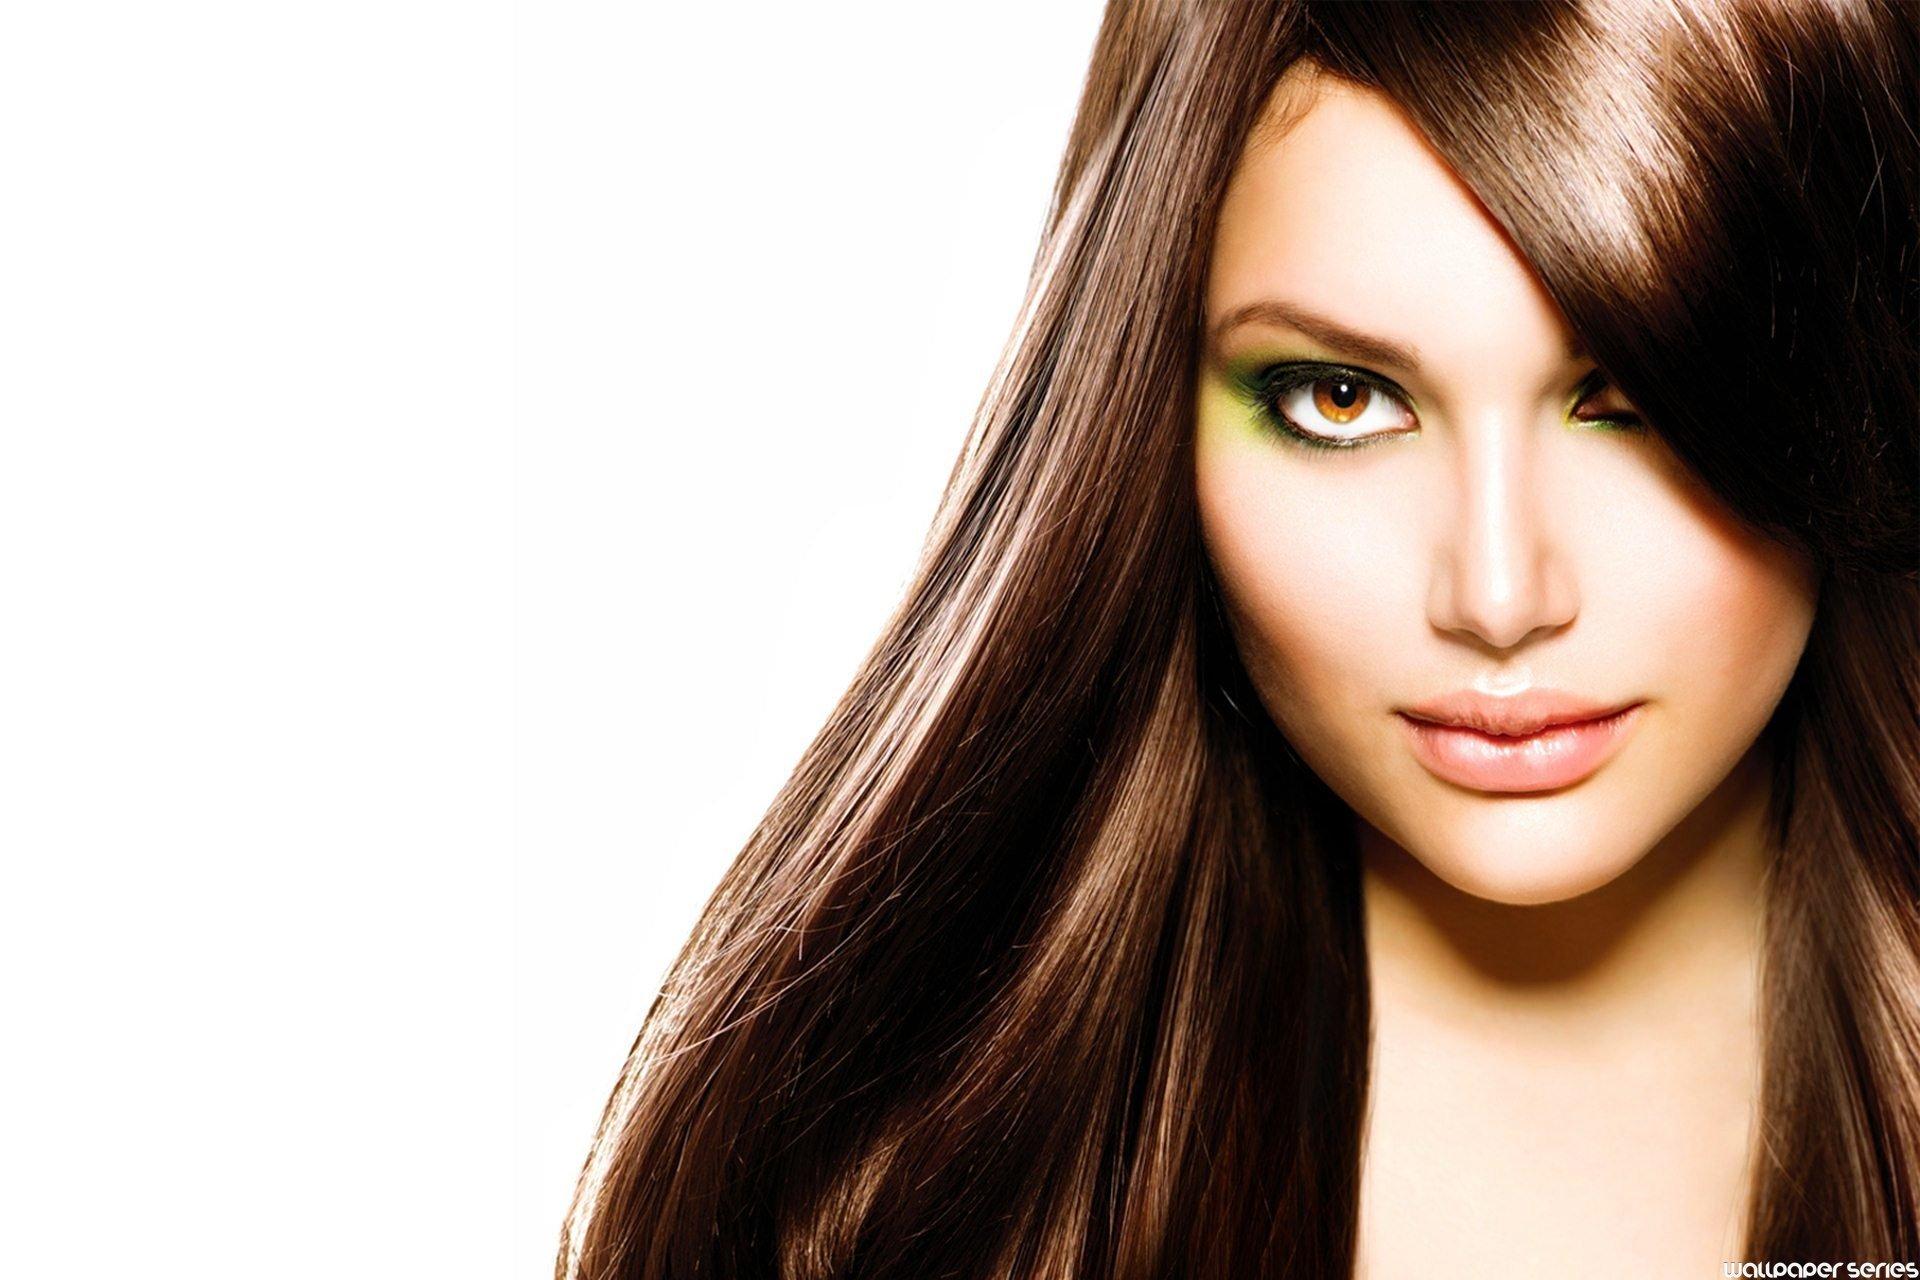 8995a734b3 424757 beautiful long hair girl Oka Aesthetic 1920x1280